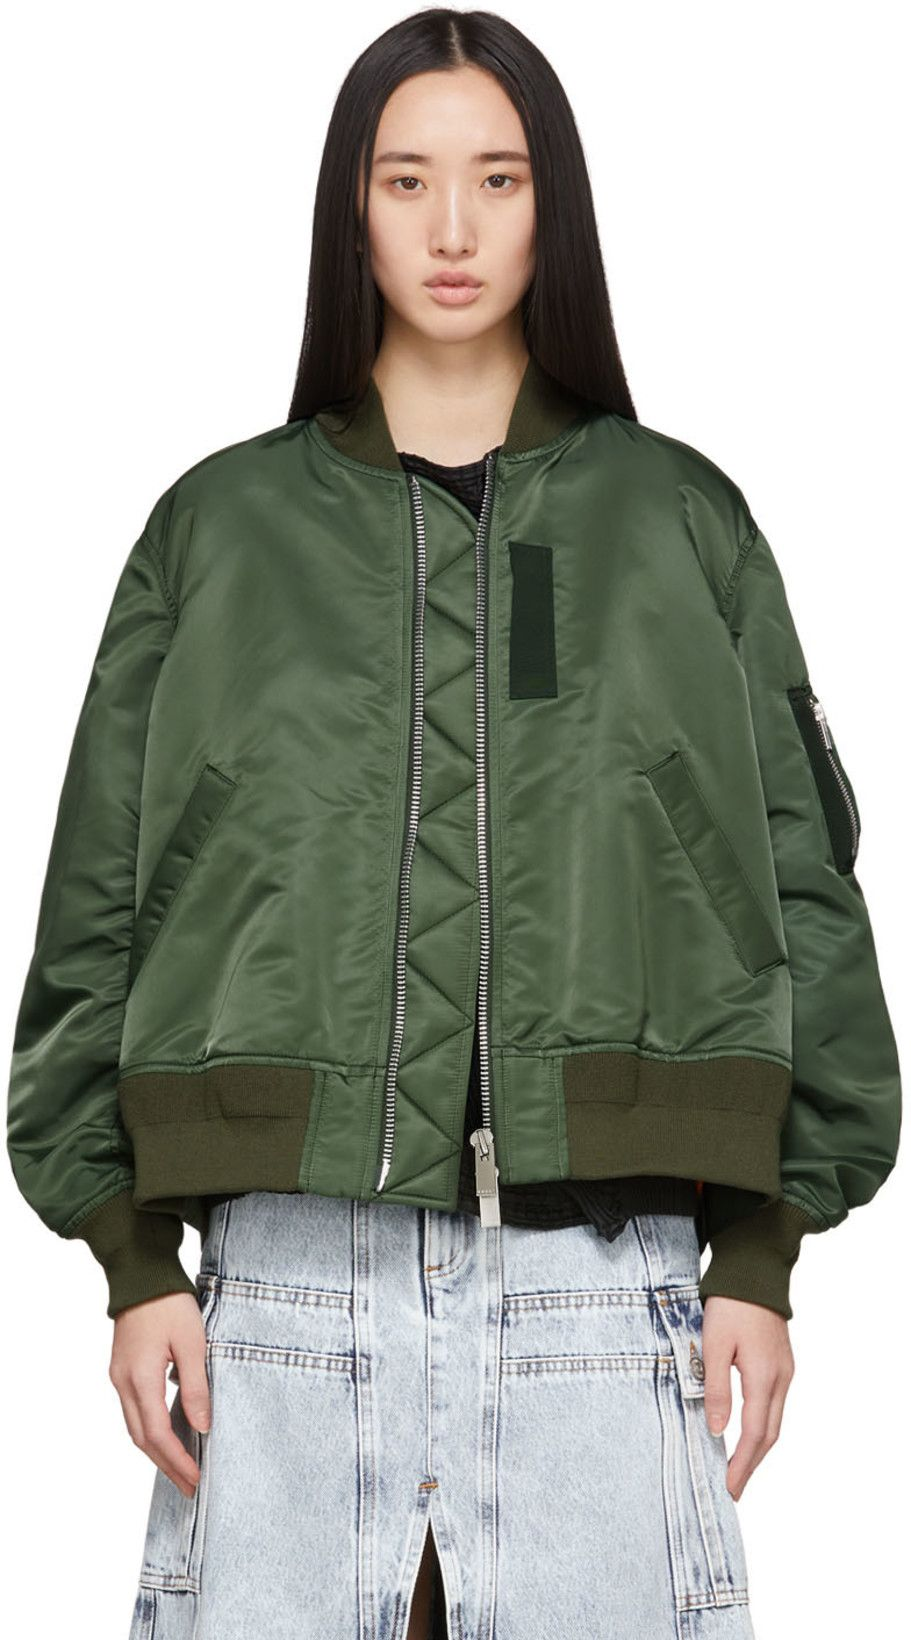 Sacai Khaki Ma 1 Bomber Jacket Ssense Fashion Bomber Jacket Clothes Design [ 1640 x 911 Pixel ]